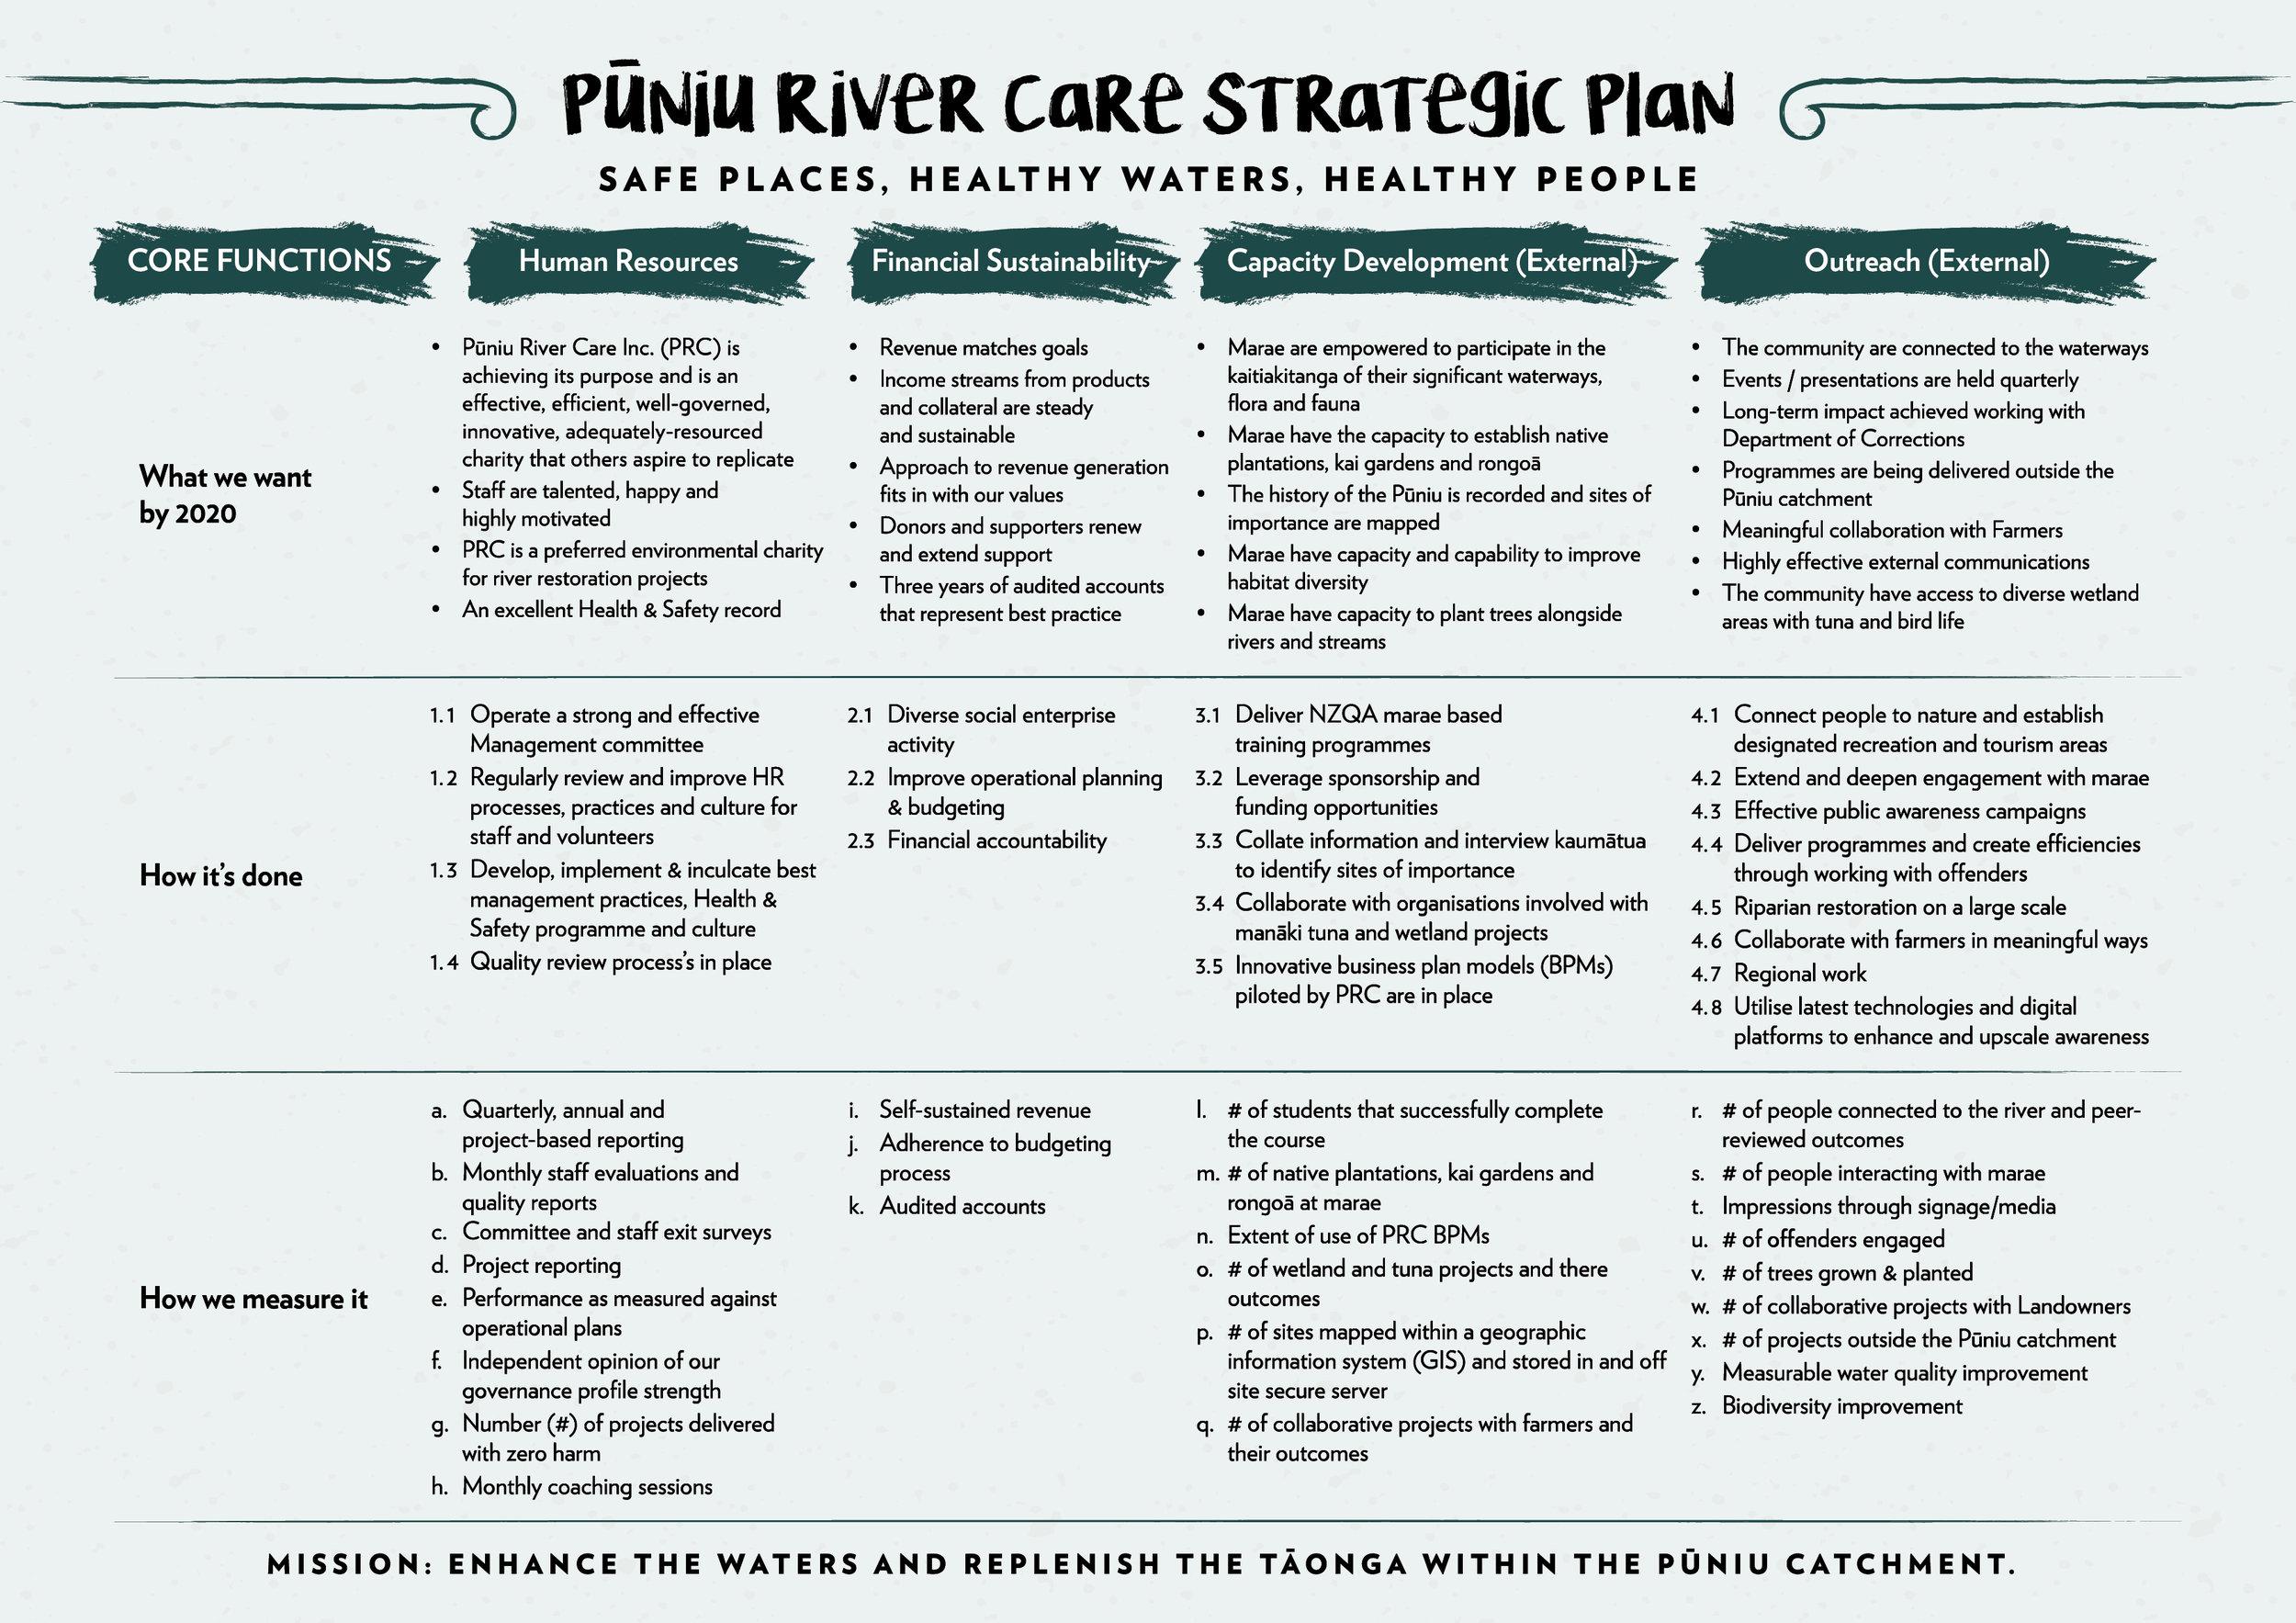 PRC_Strategic_Plan_Final.jpg